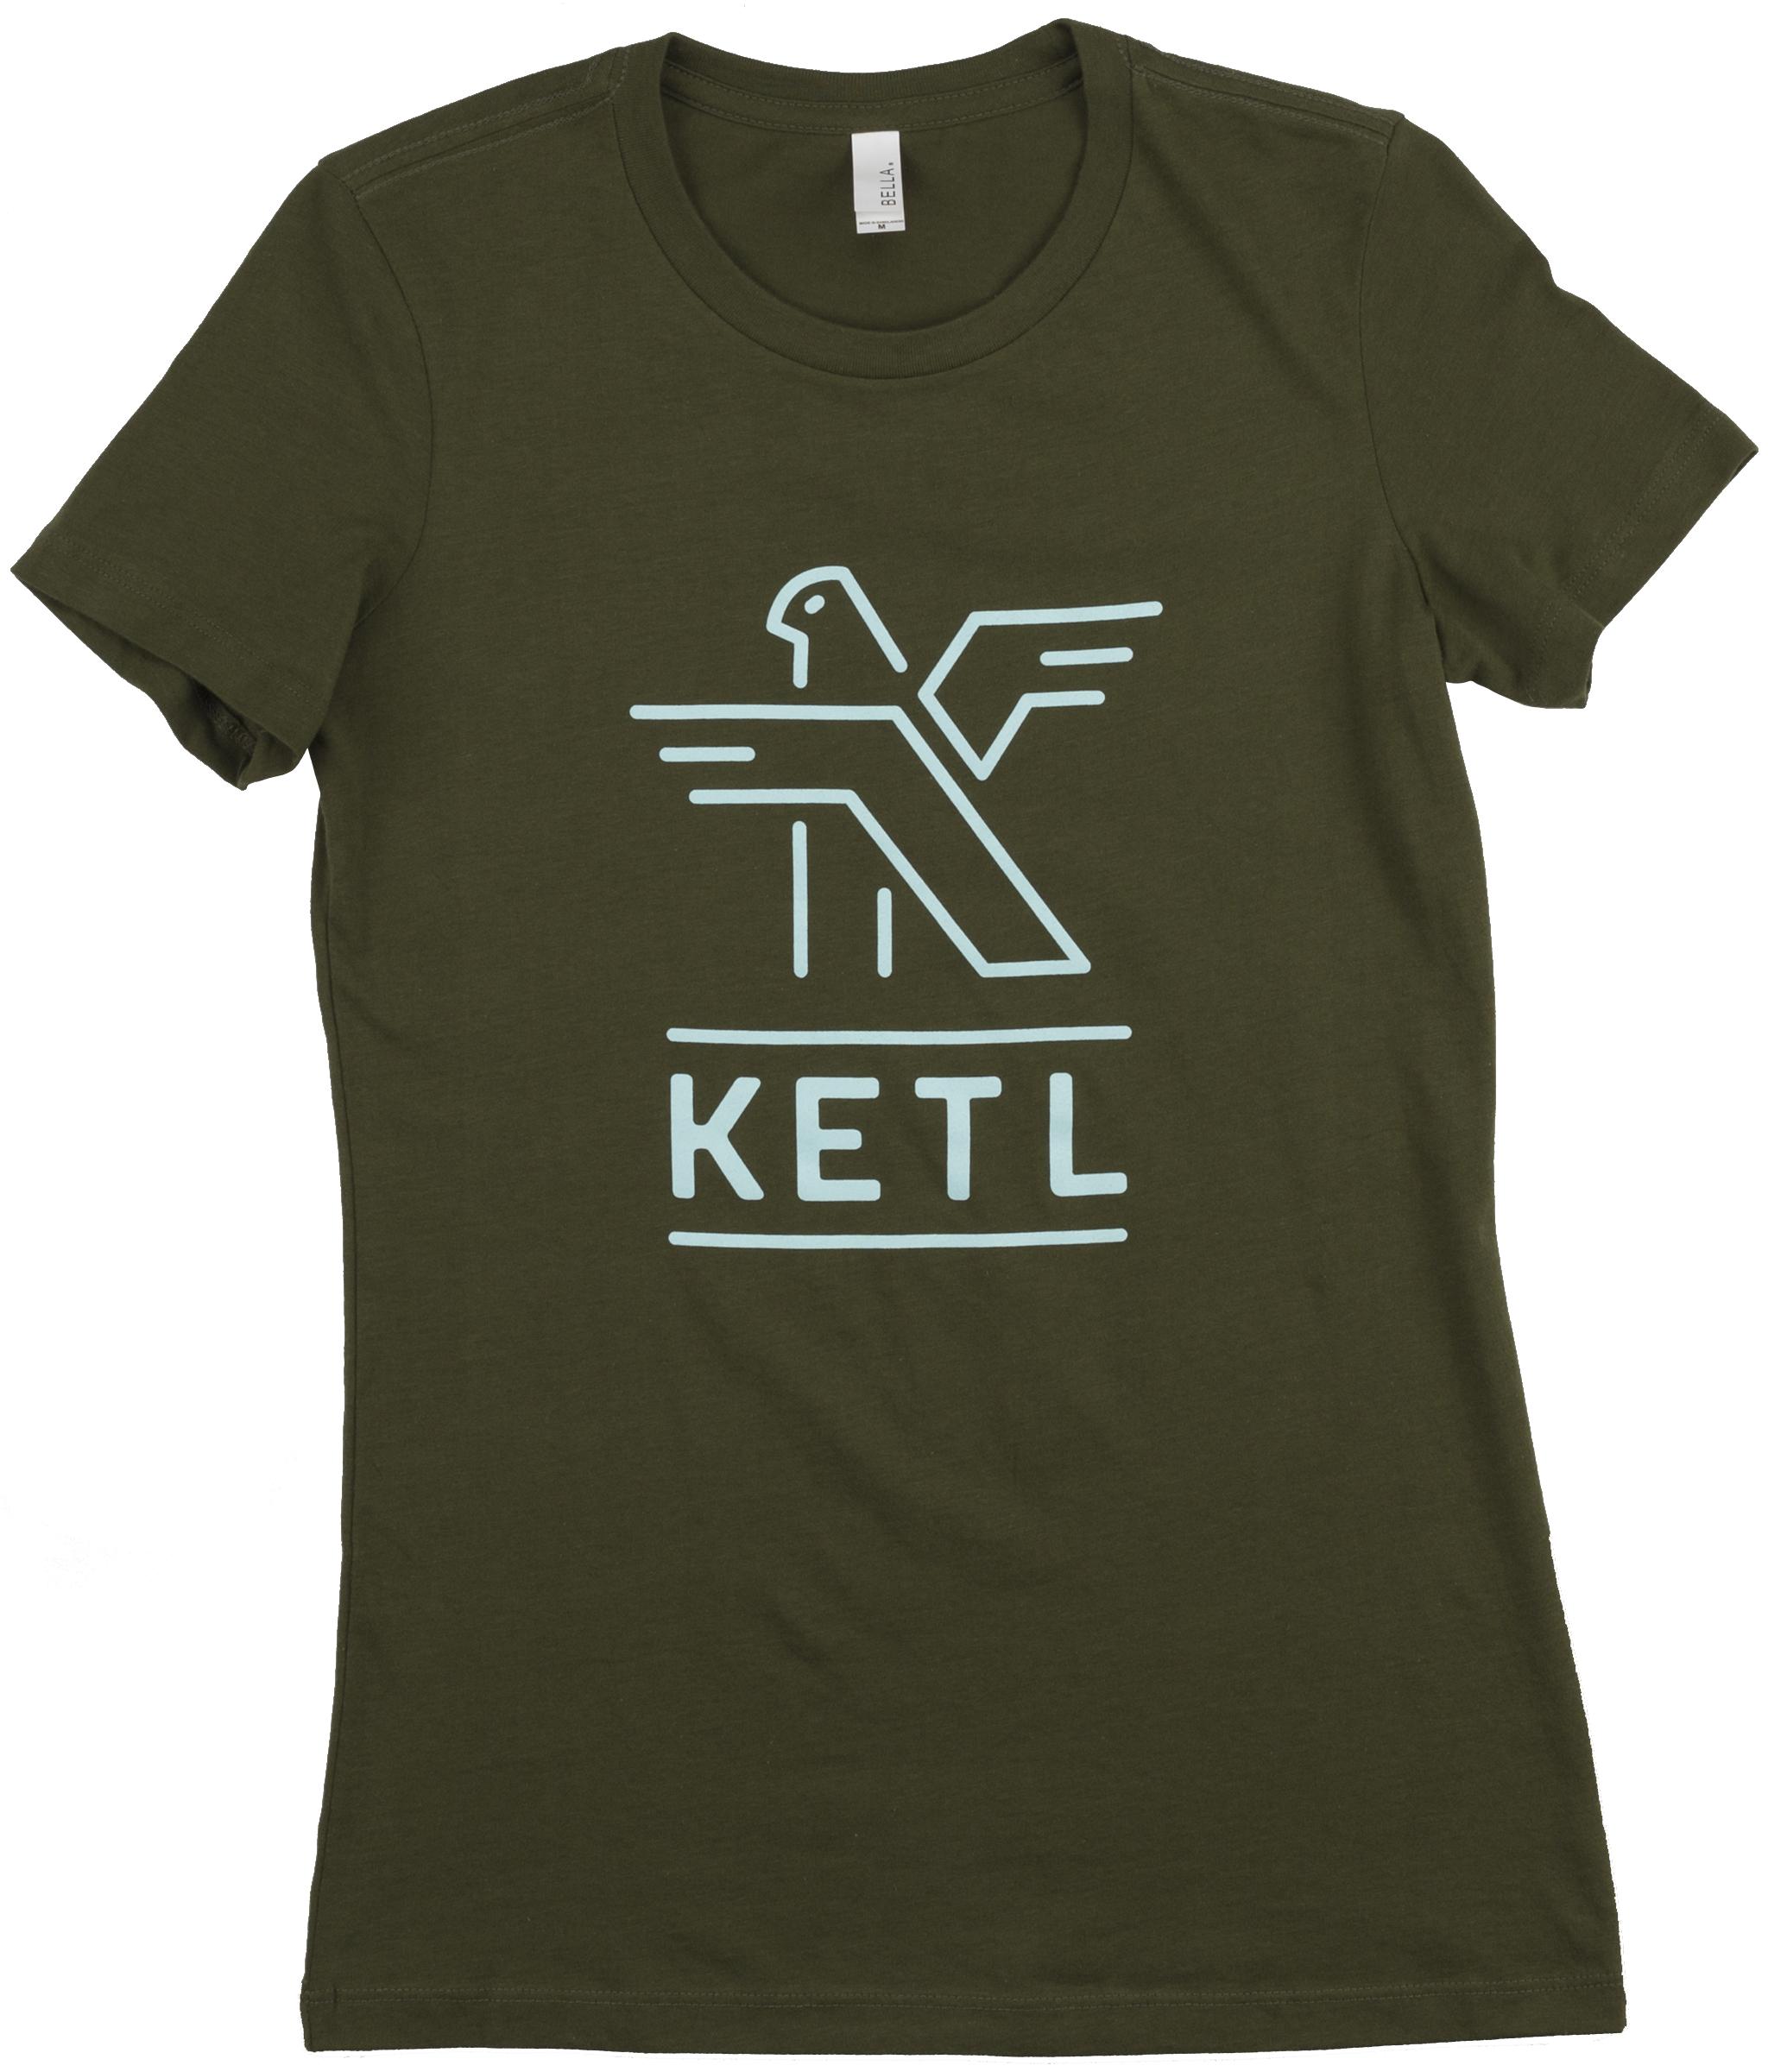 Ketl Women's Logo T-Shirt